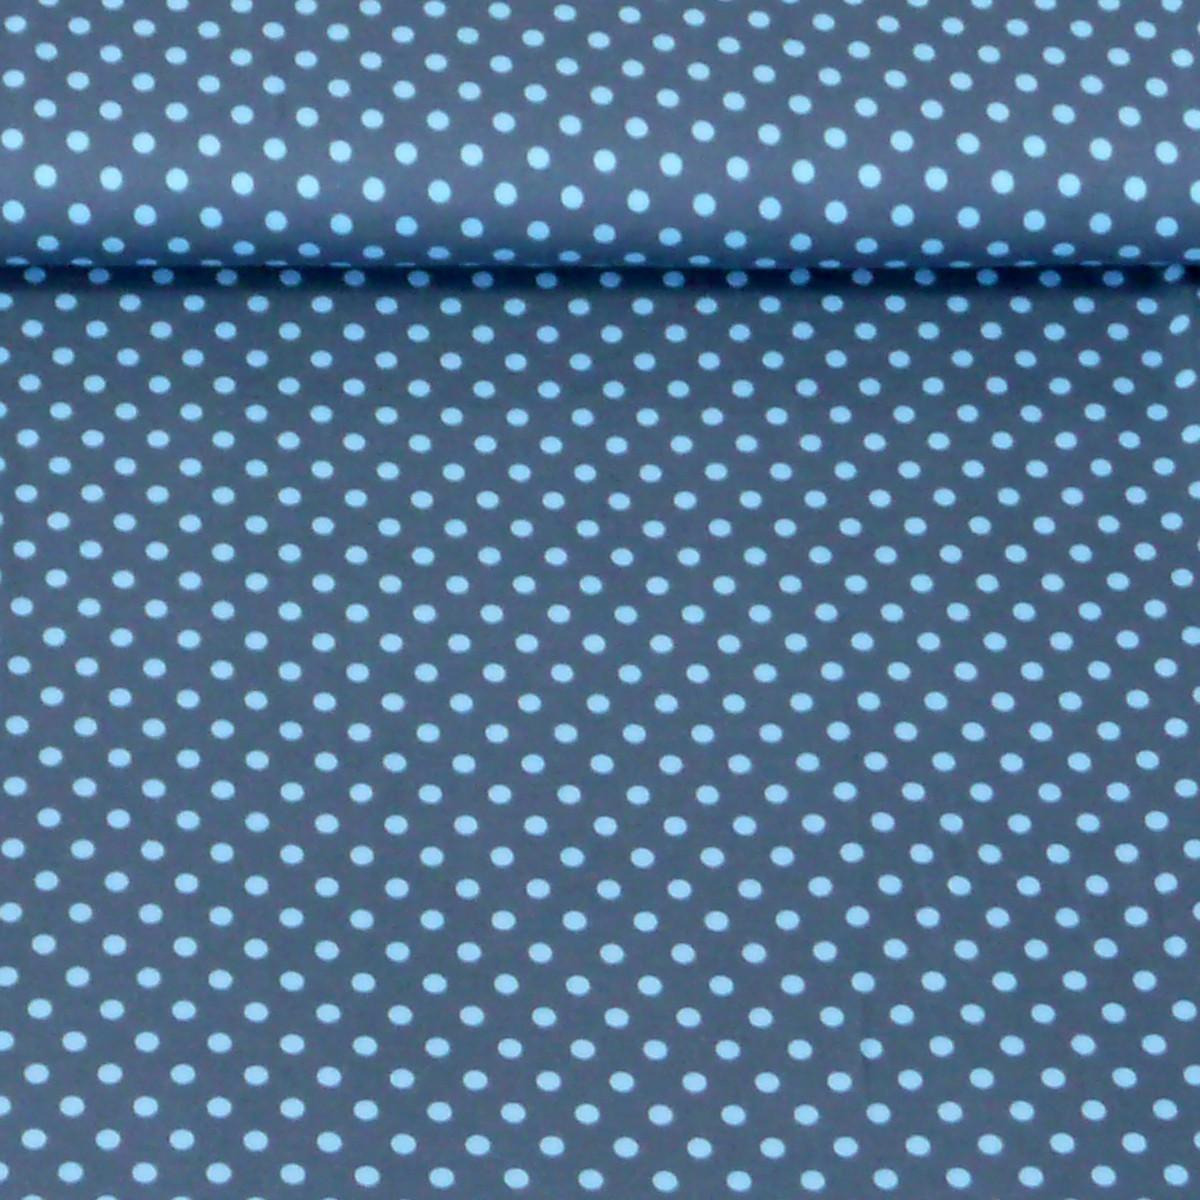 jersey stoff punkte dunkelblau jeans blau stoffe stoffe gemustert stoff punkte. Black Bedroom Furniture Sets. Home Design Ideas